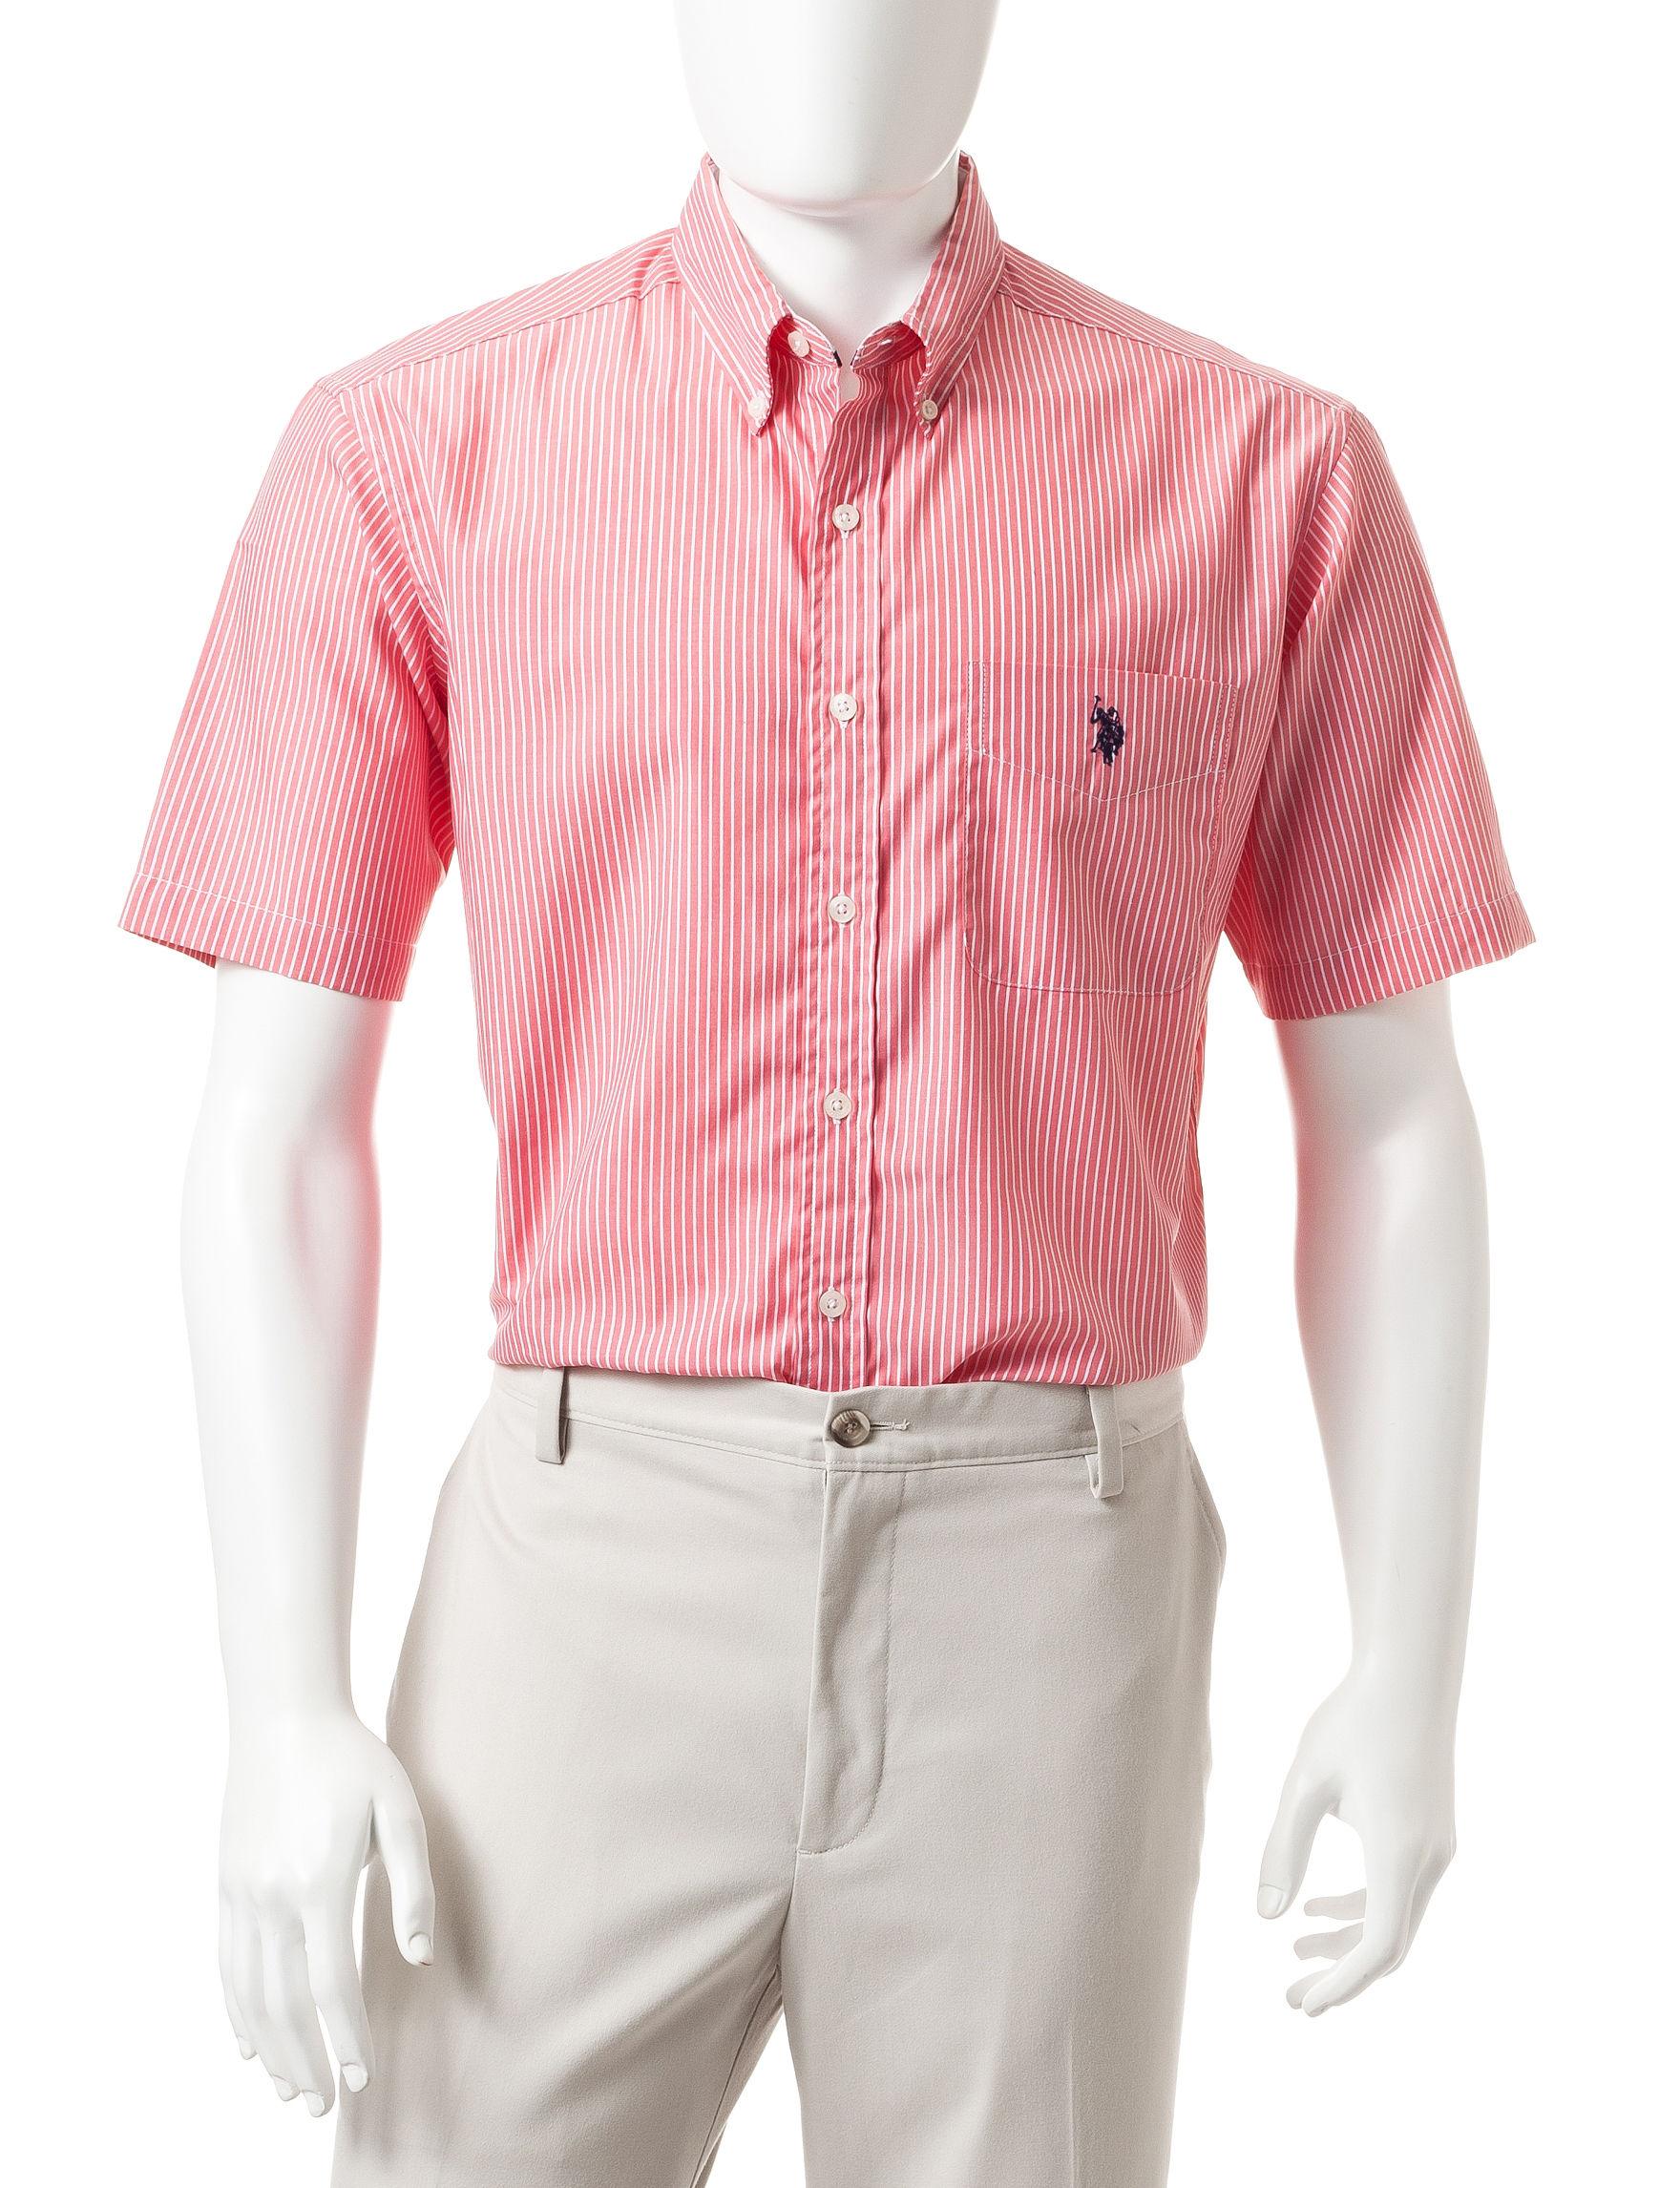 U.S. Polo Assn. Pink Casual Button Down Shirts